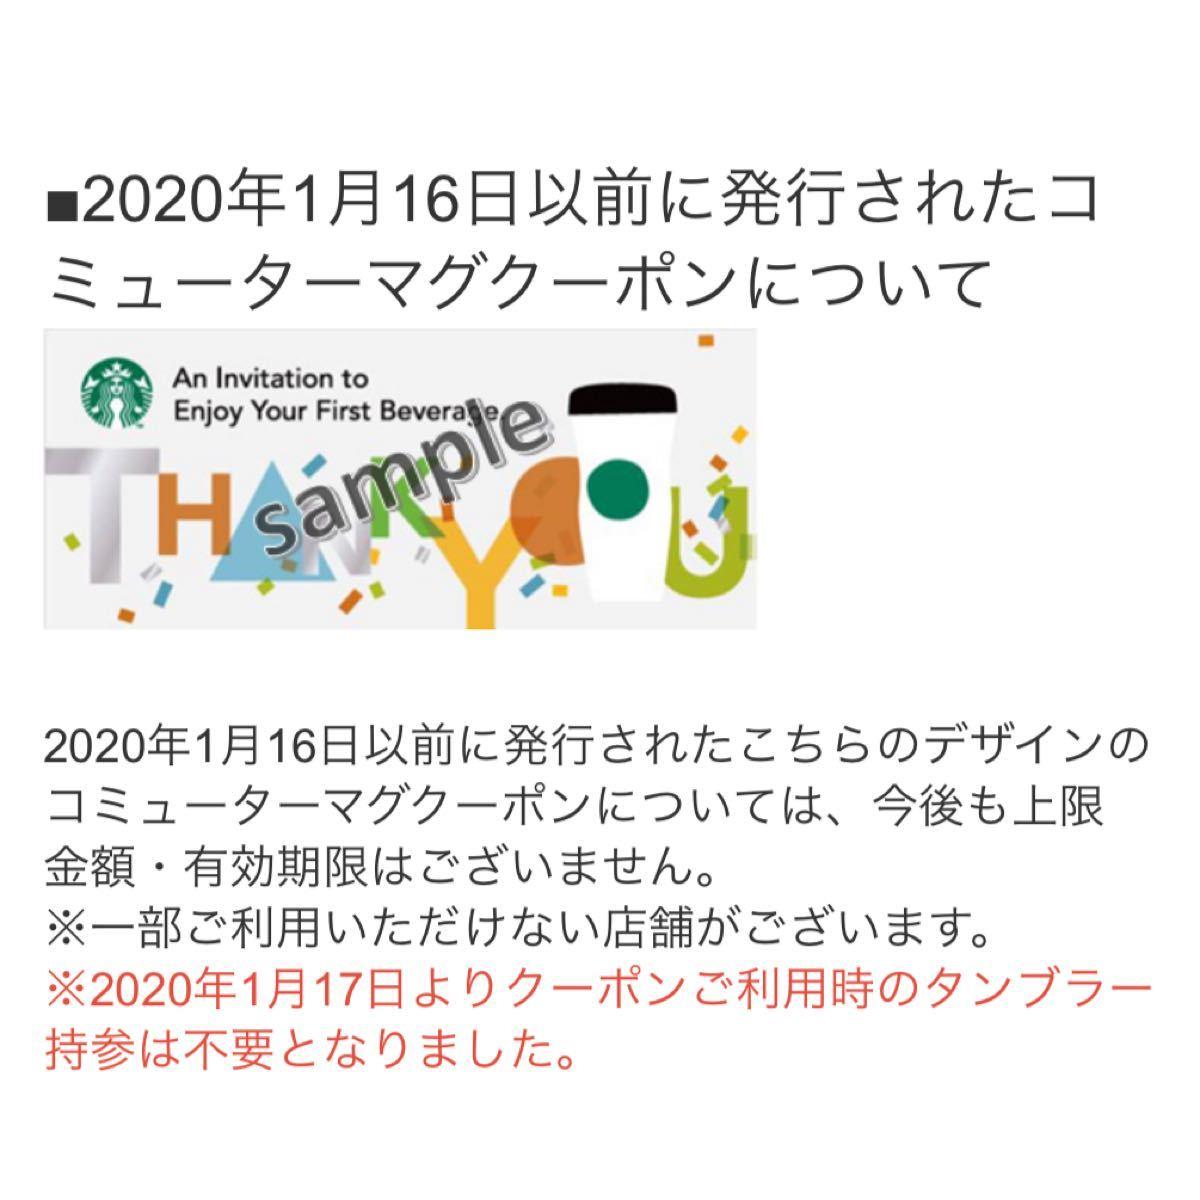 Starbucks スタバ ドリンクチケット3枚